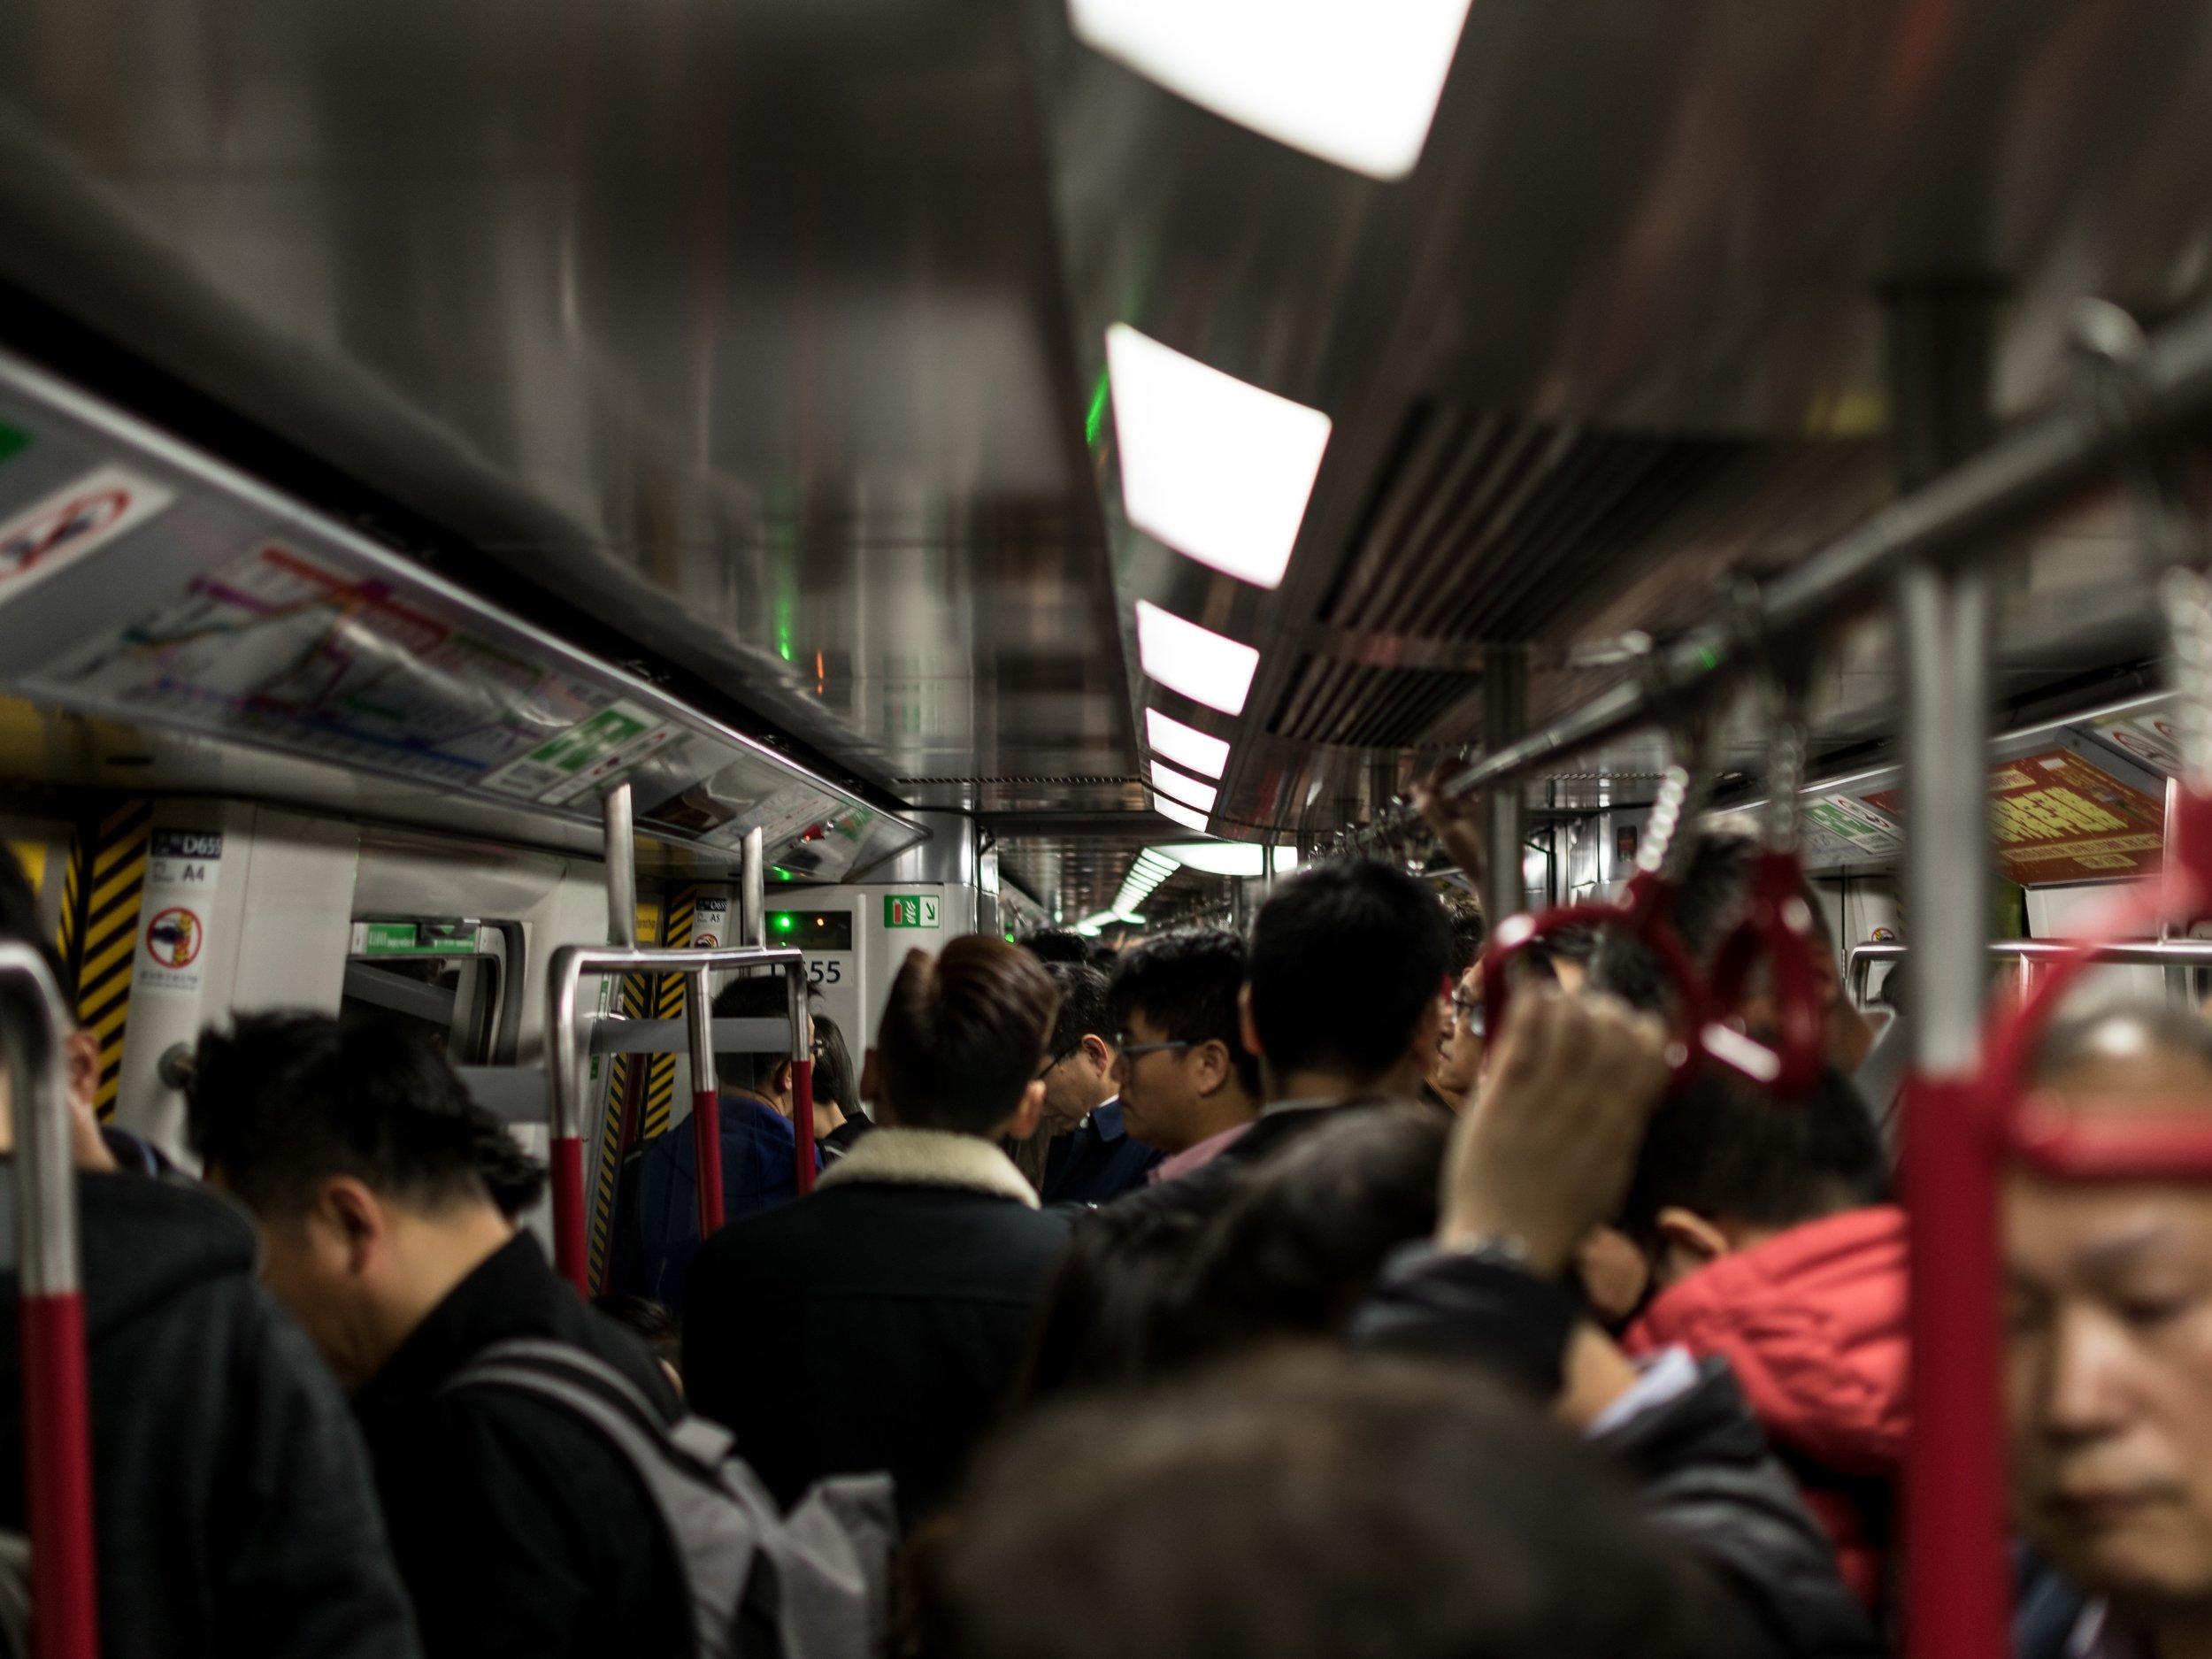 Riding the train in Hong Kong